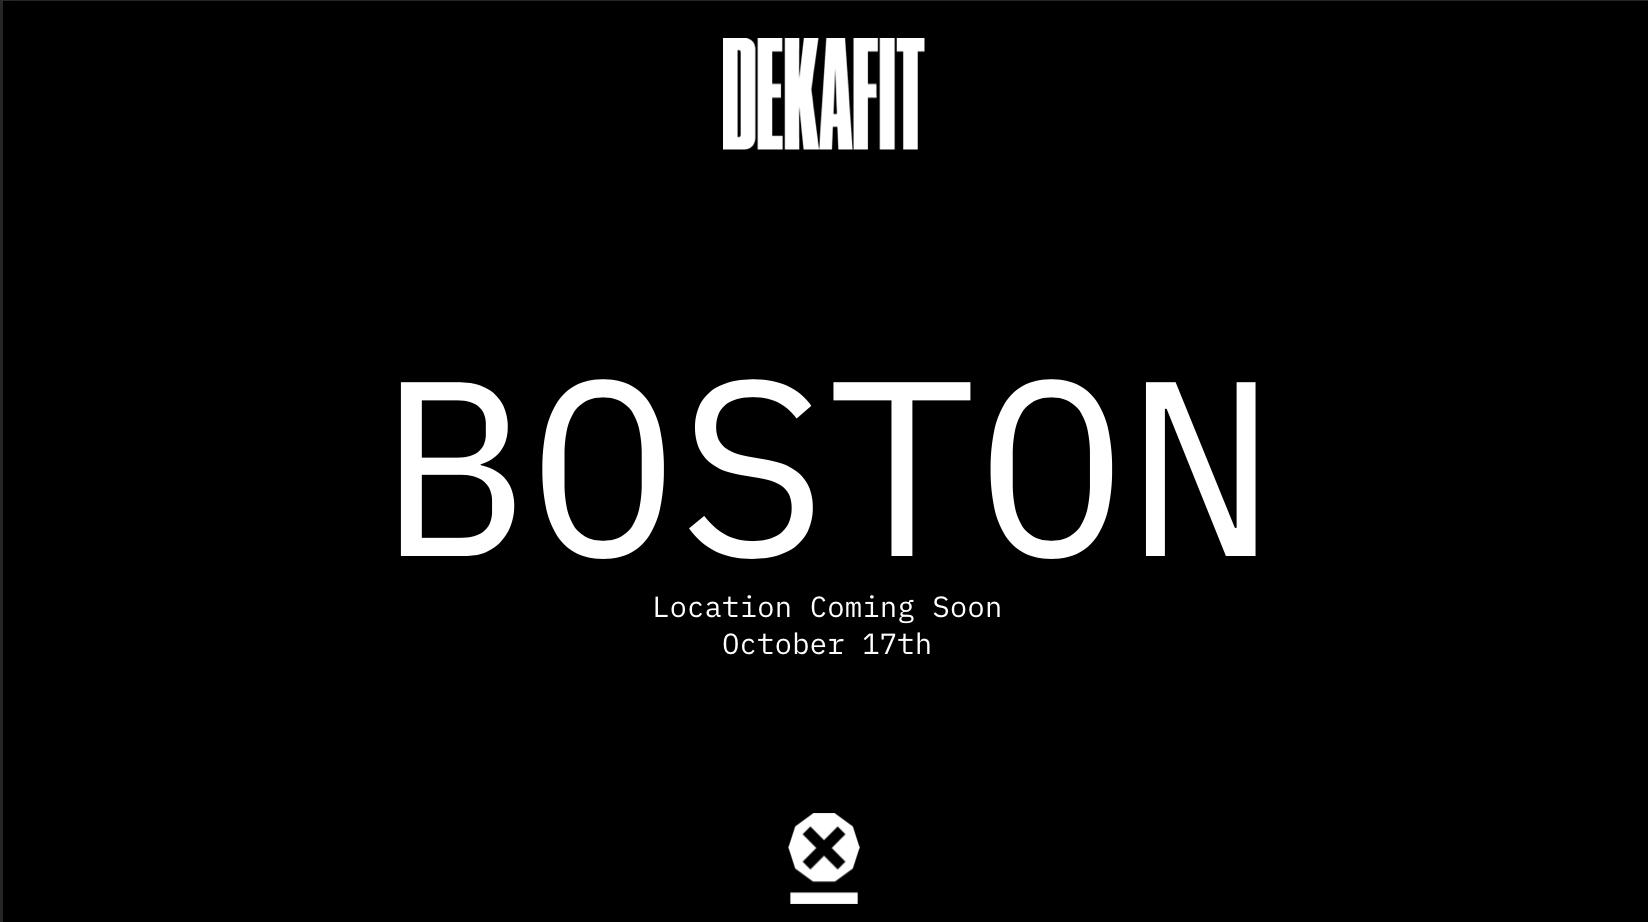 DEKAFIT Boston - PRE REGISTRATION